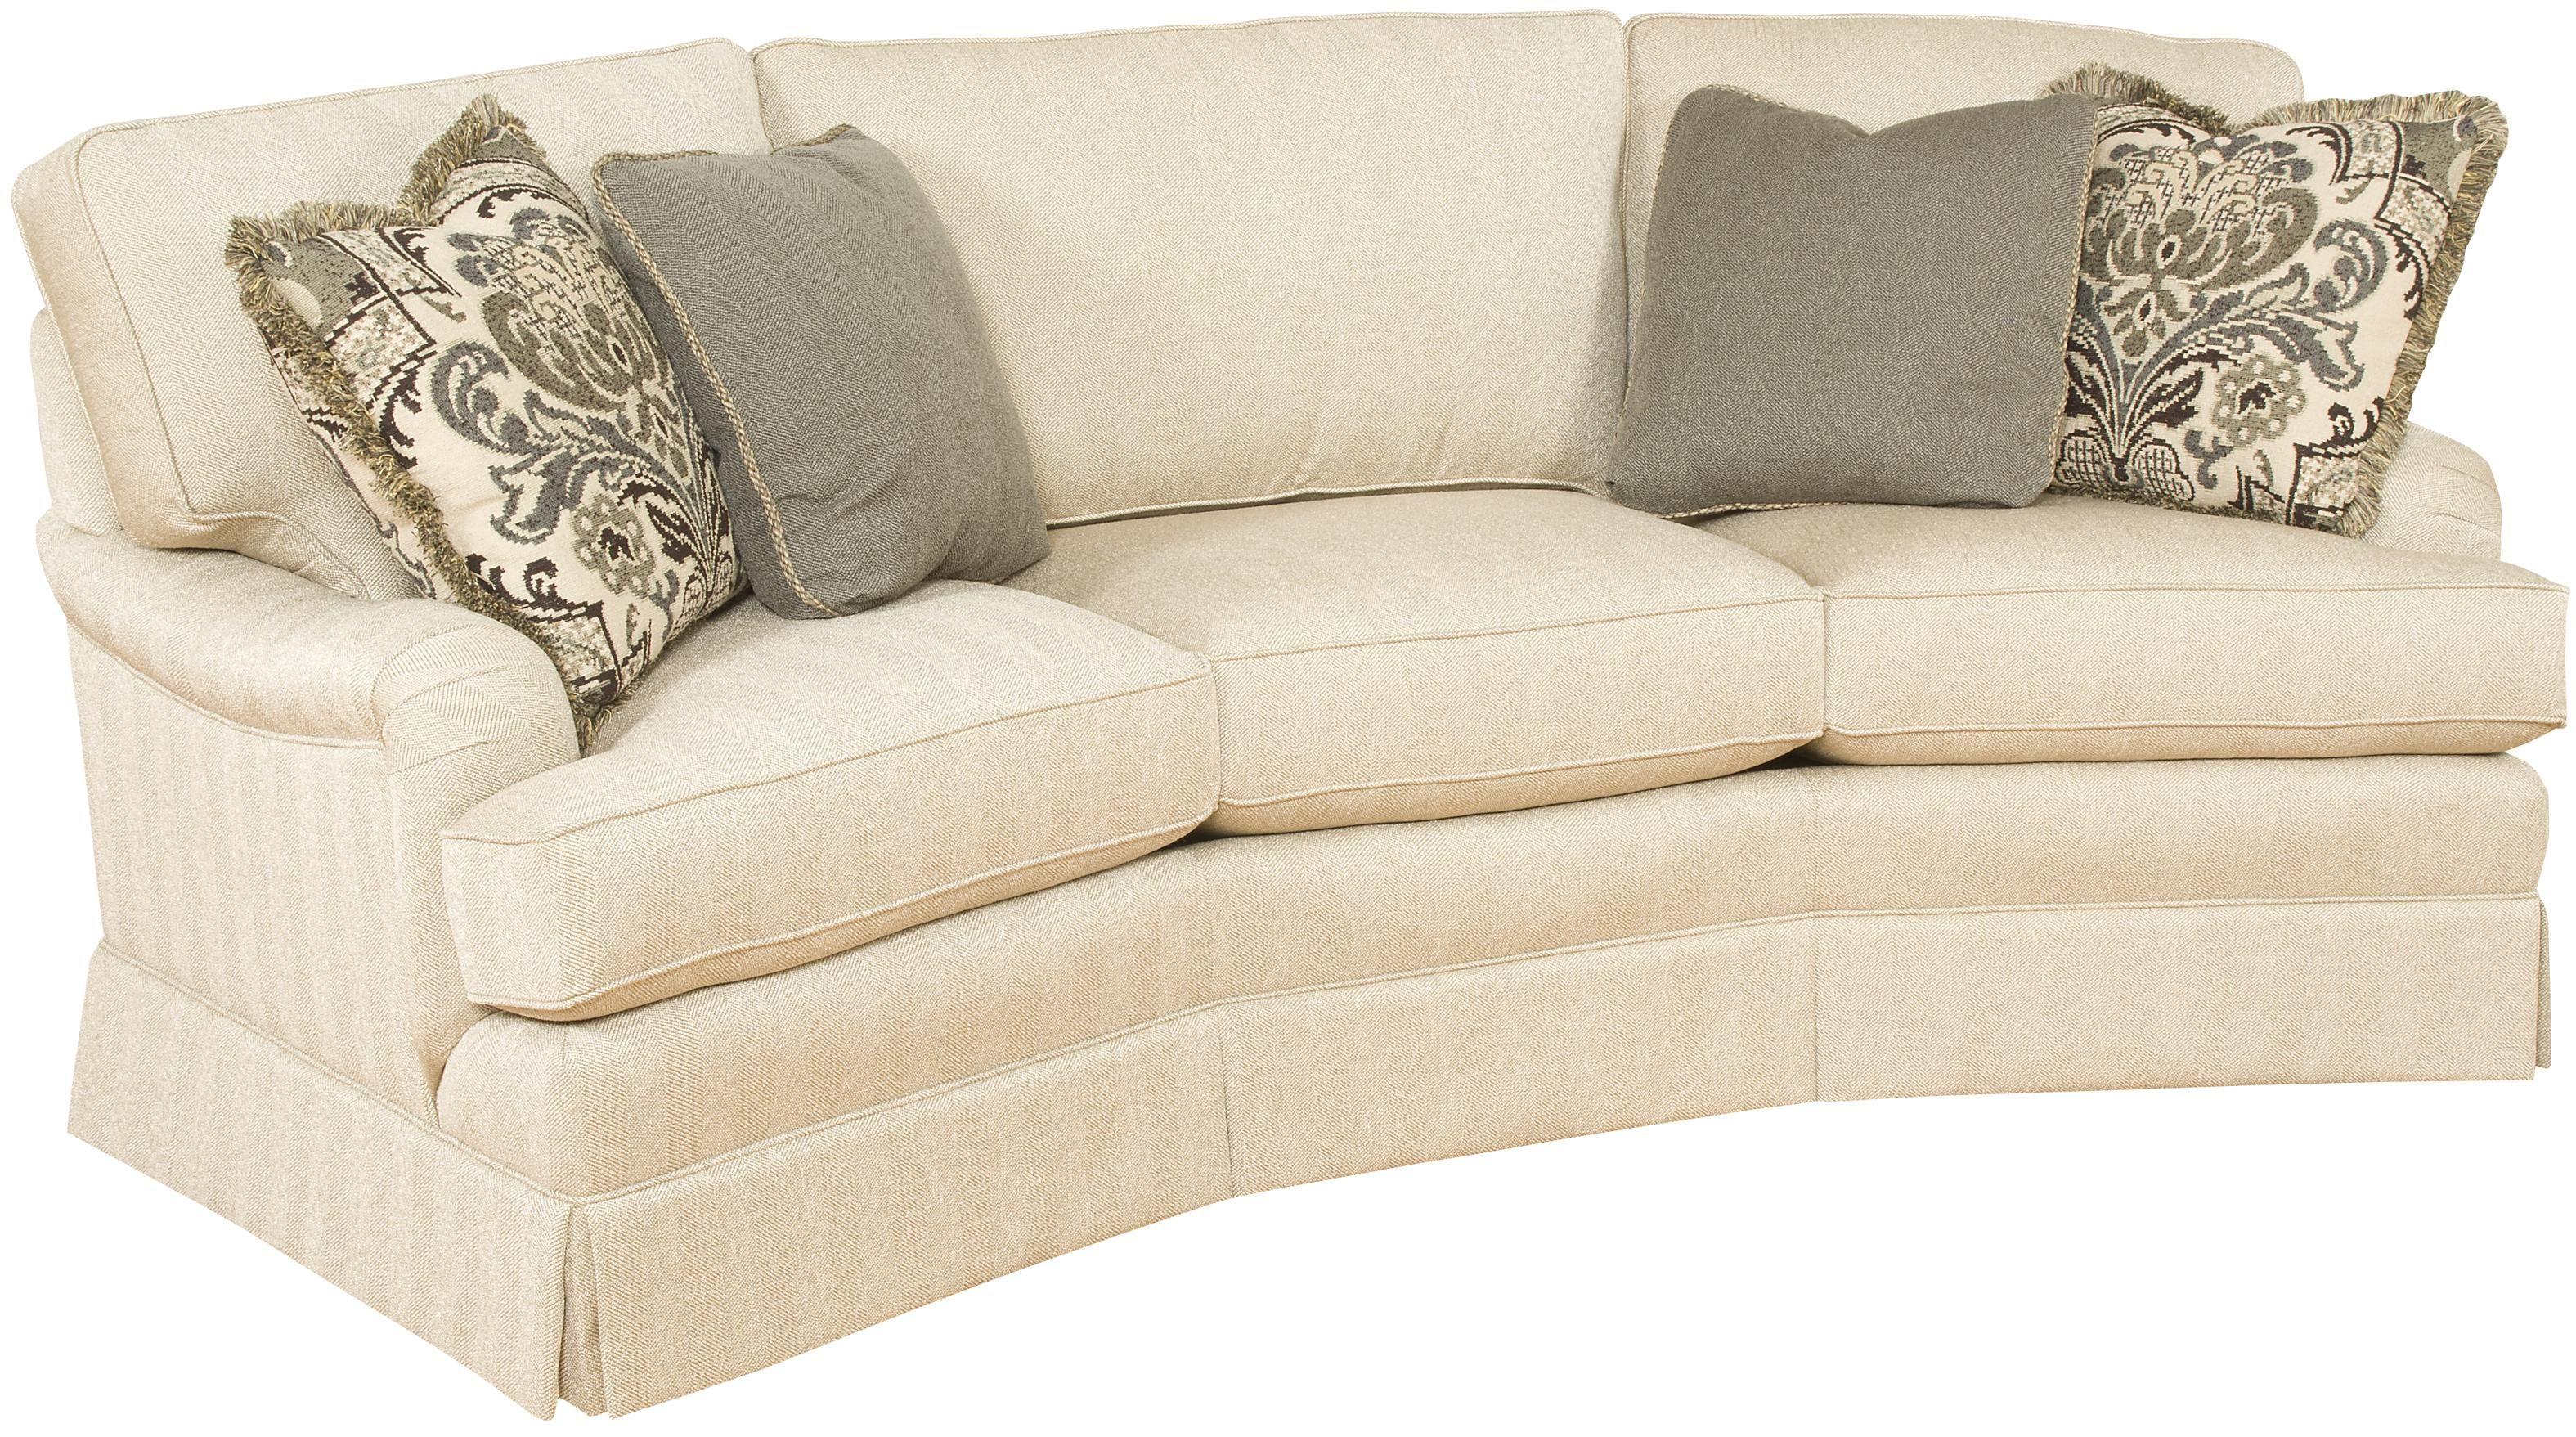 Chatham Customizable Conversation Sofa with English Arms and Skirt ...